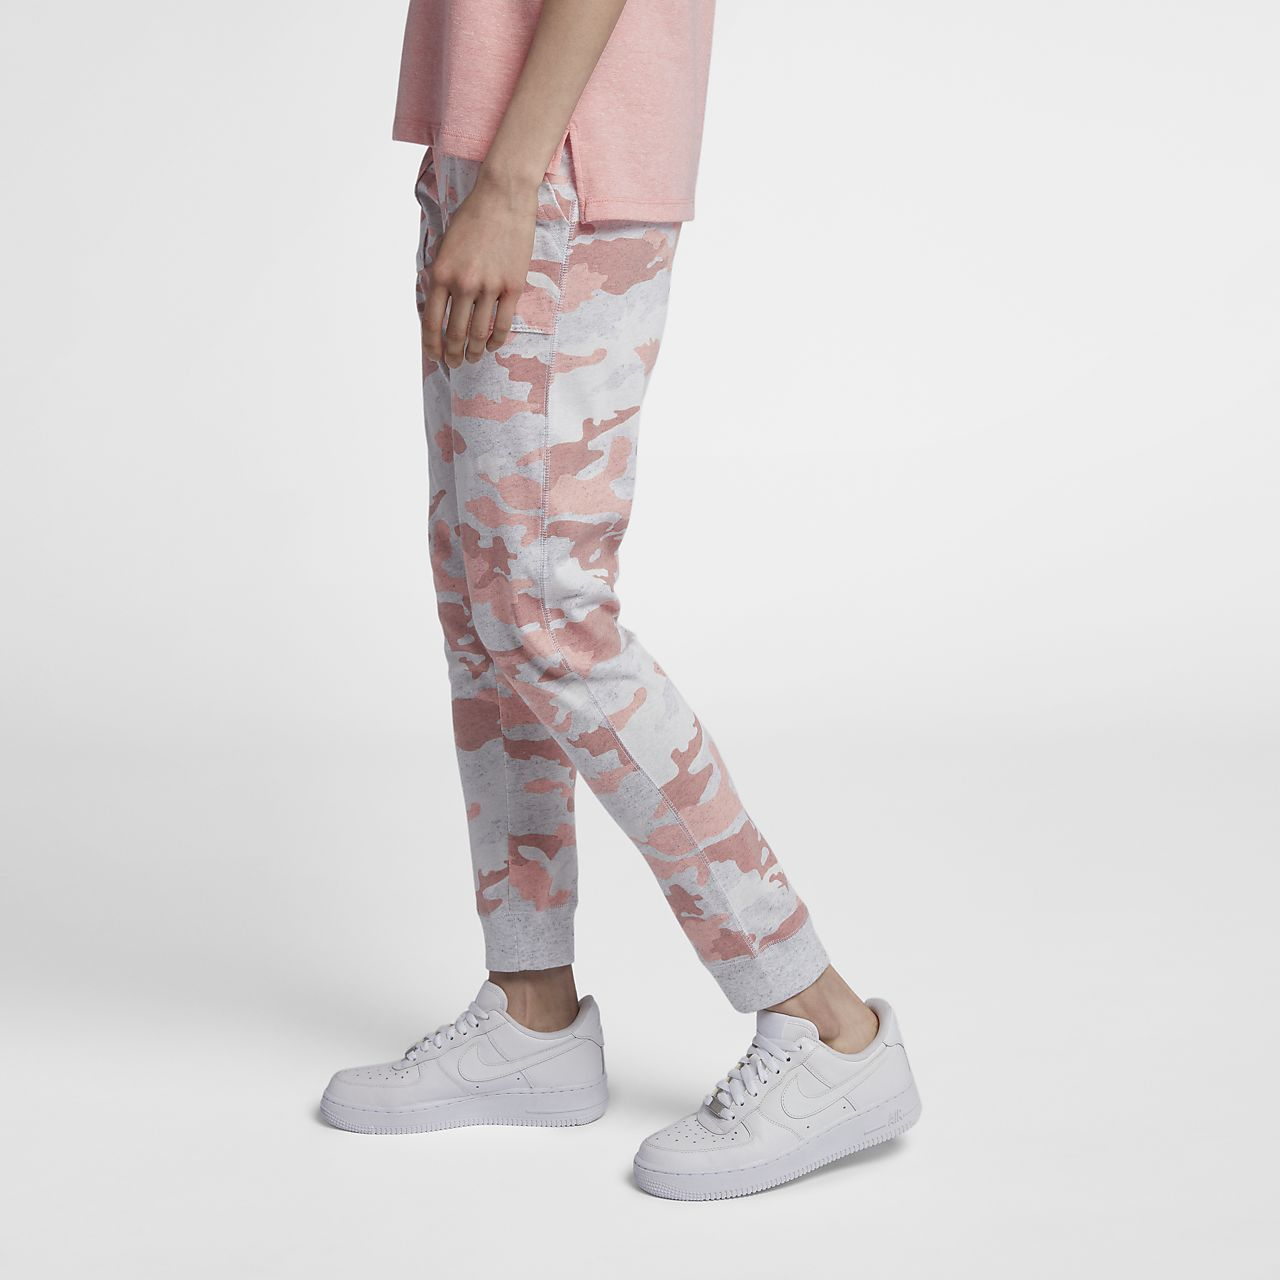 Sportswear Gym Nike Women's Vintage Camo Trousers oWrxdBQCeE